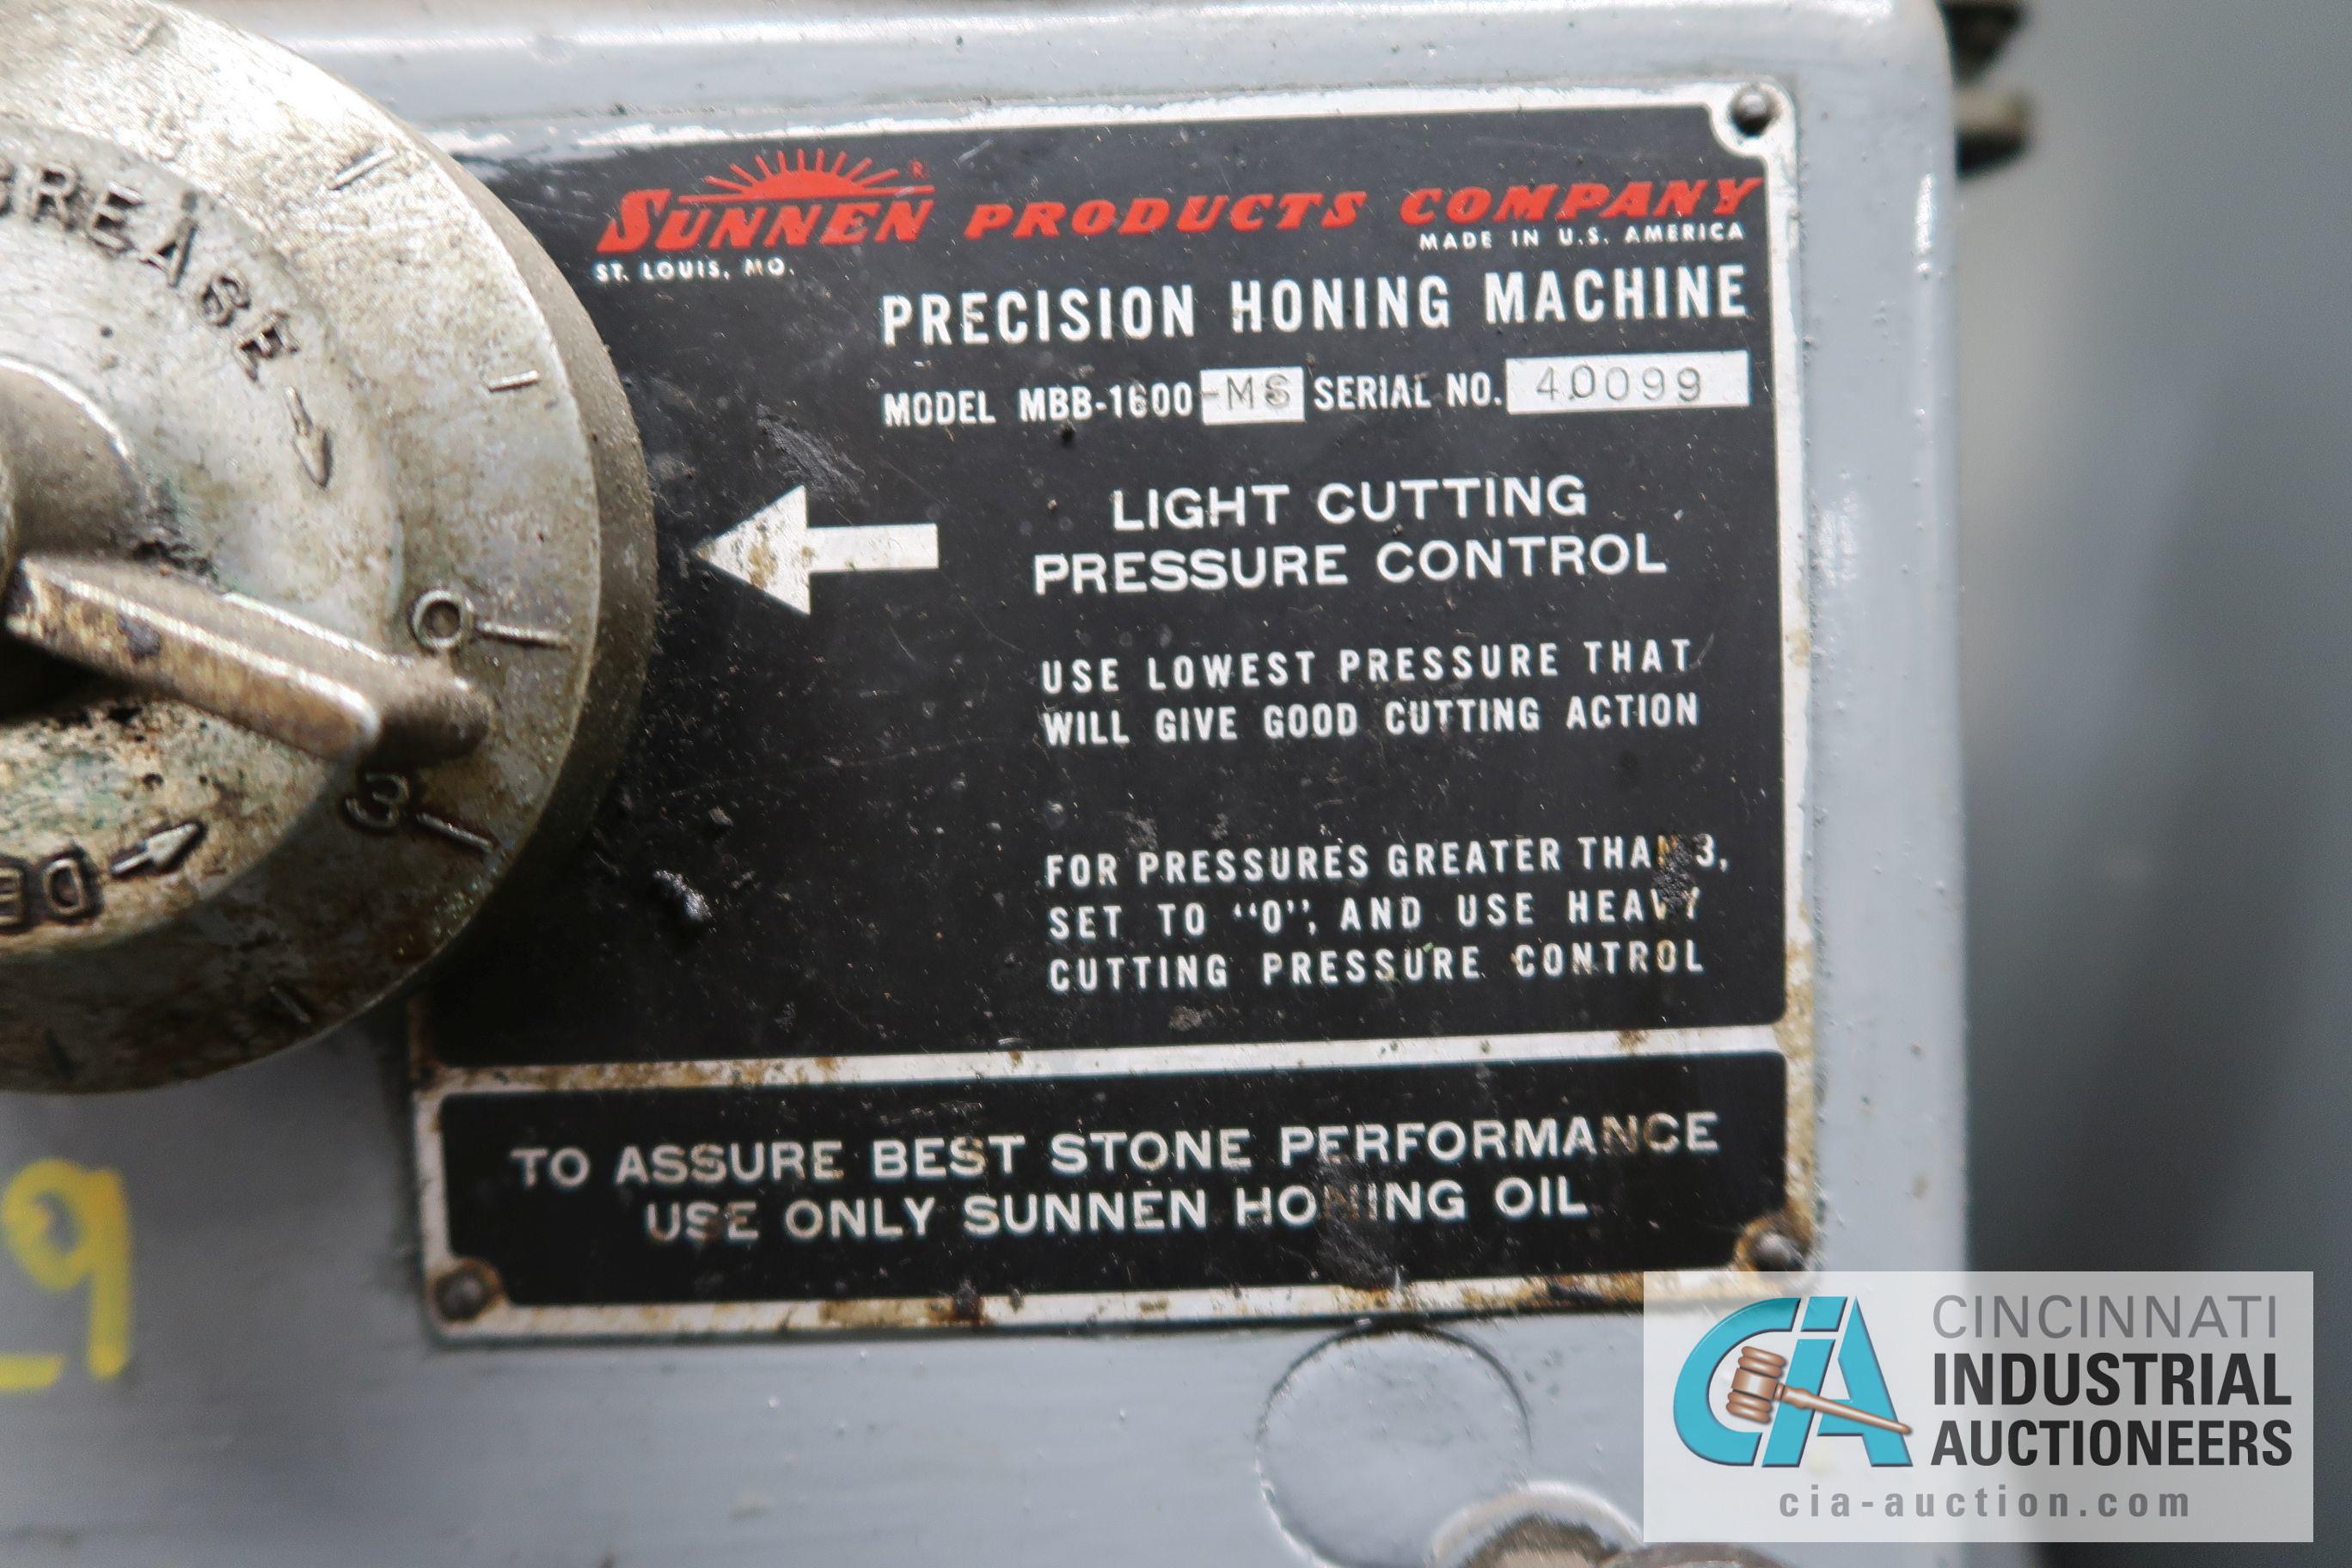 SUNNEN MBB-1600-M6 PRECISION HONING MACHINE; S/N 40099 - Image 5 of 5